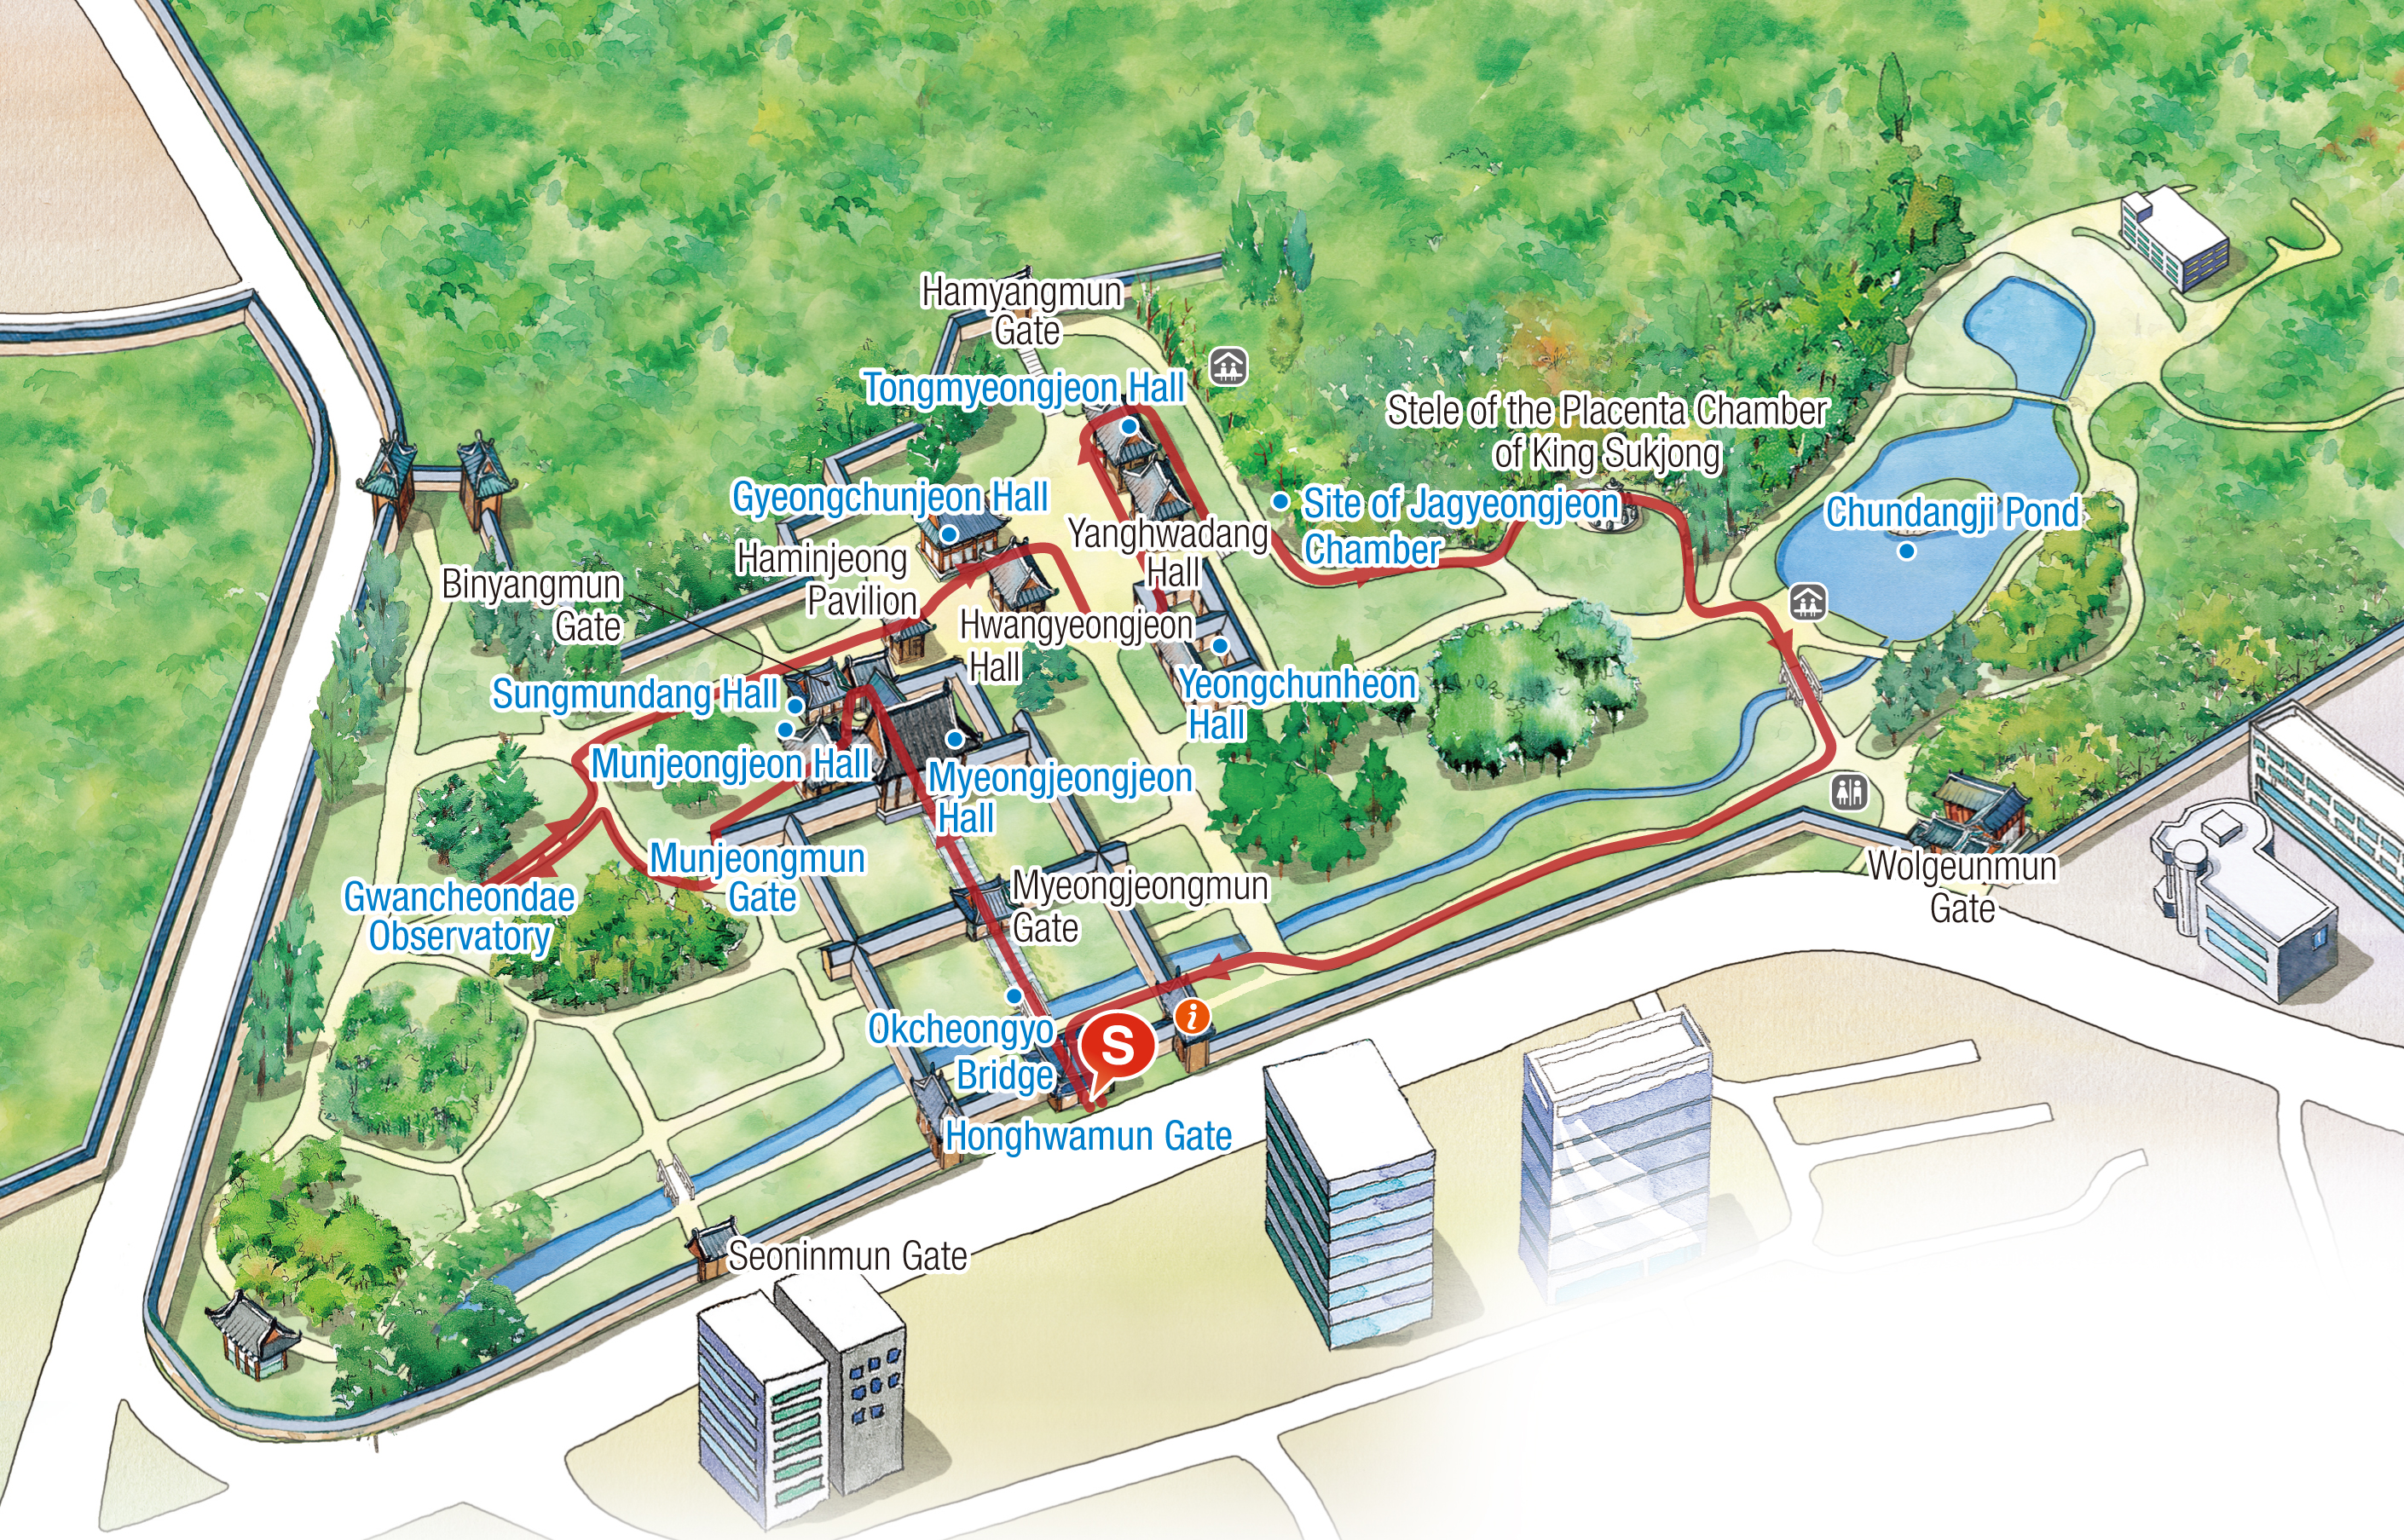 Changgyeonggung course map : Changgyeonggung Honghwamun - Okcheongyo - Myeongjeongjeon Sungmundang - Munjeongjeon - Munjeongmun - Gwancheondae - Gyeongchunjeon - Yeongchunheon - Tongmyeongjeon - Jagyeongjeon Site - Chundangji - Changgyeonggung Honghwamun